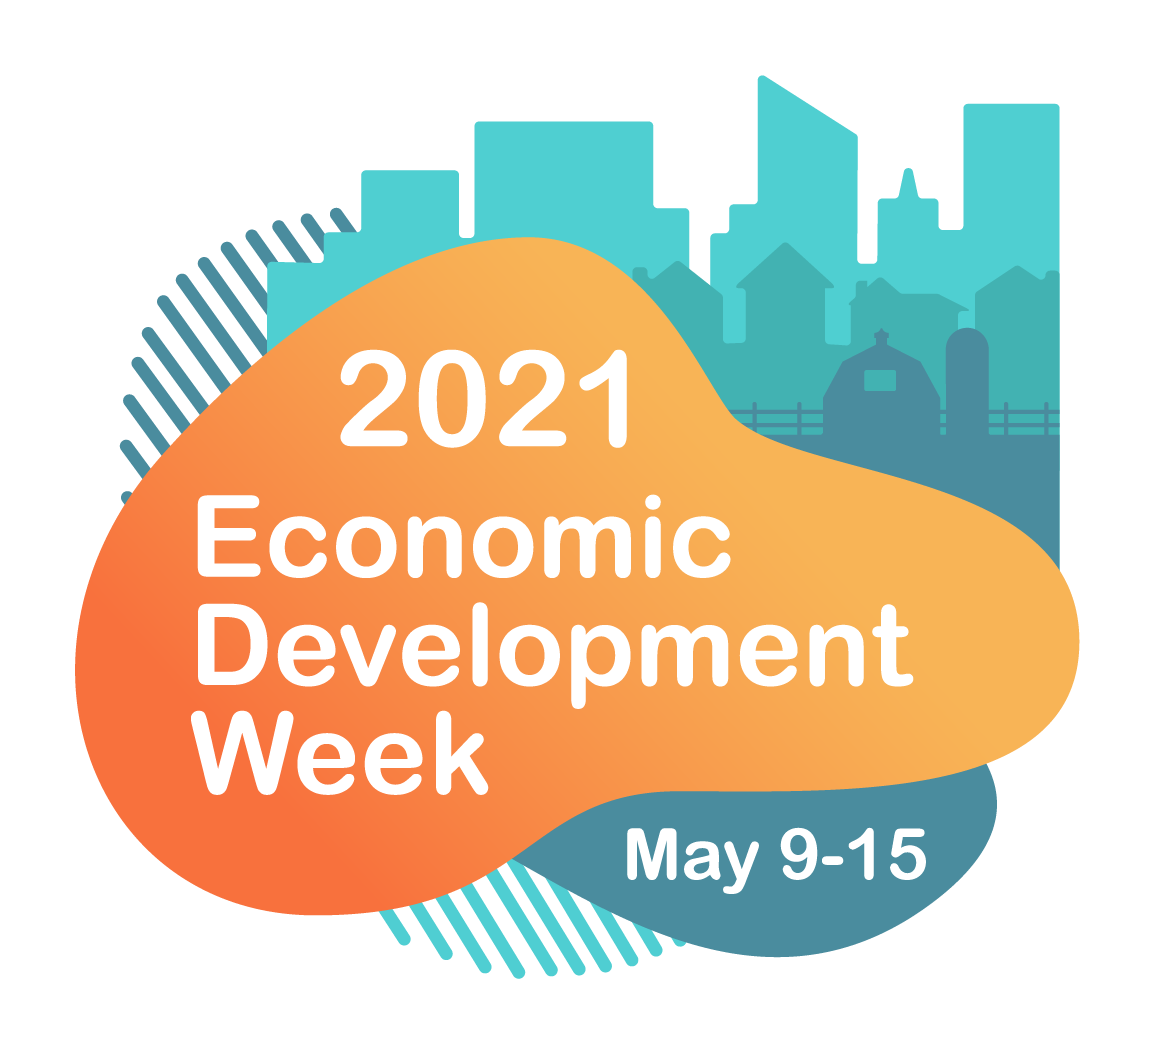 PEDC HOSTS NATIONAL ECONOMIC DEVELOPMENT WEEK CELEBRATION - MAY 9-15, 2021 Main Photo